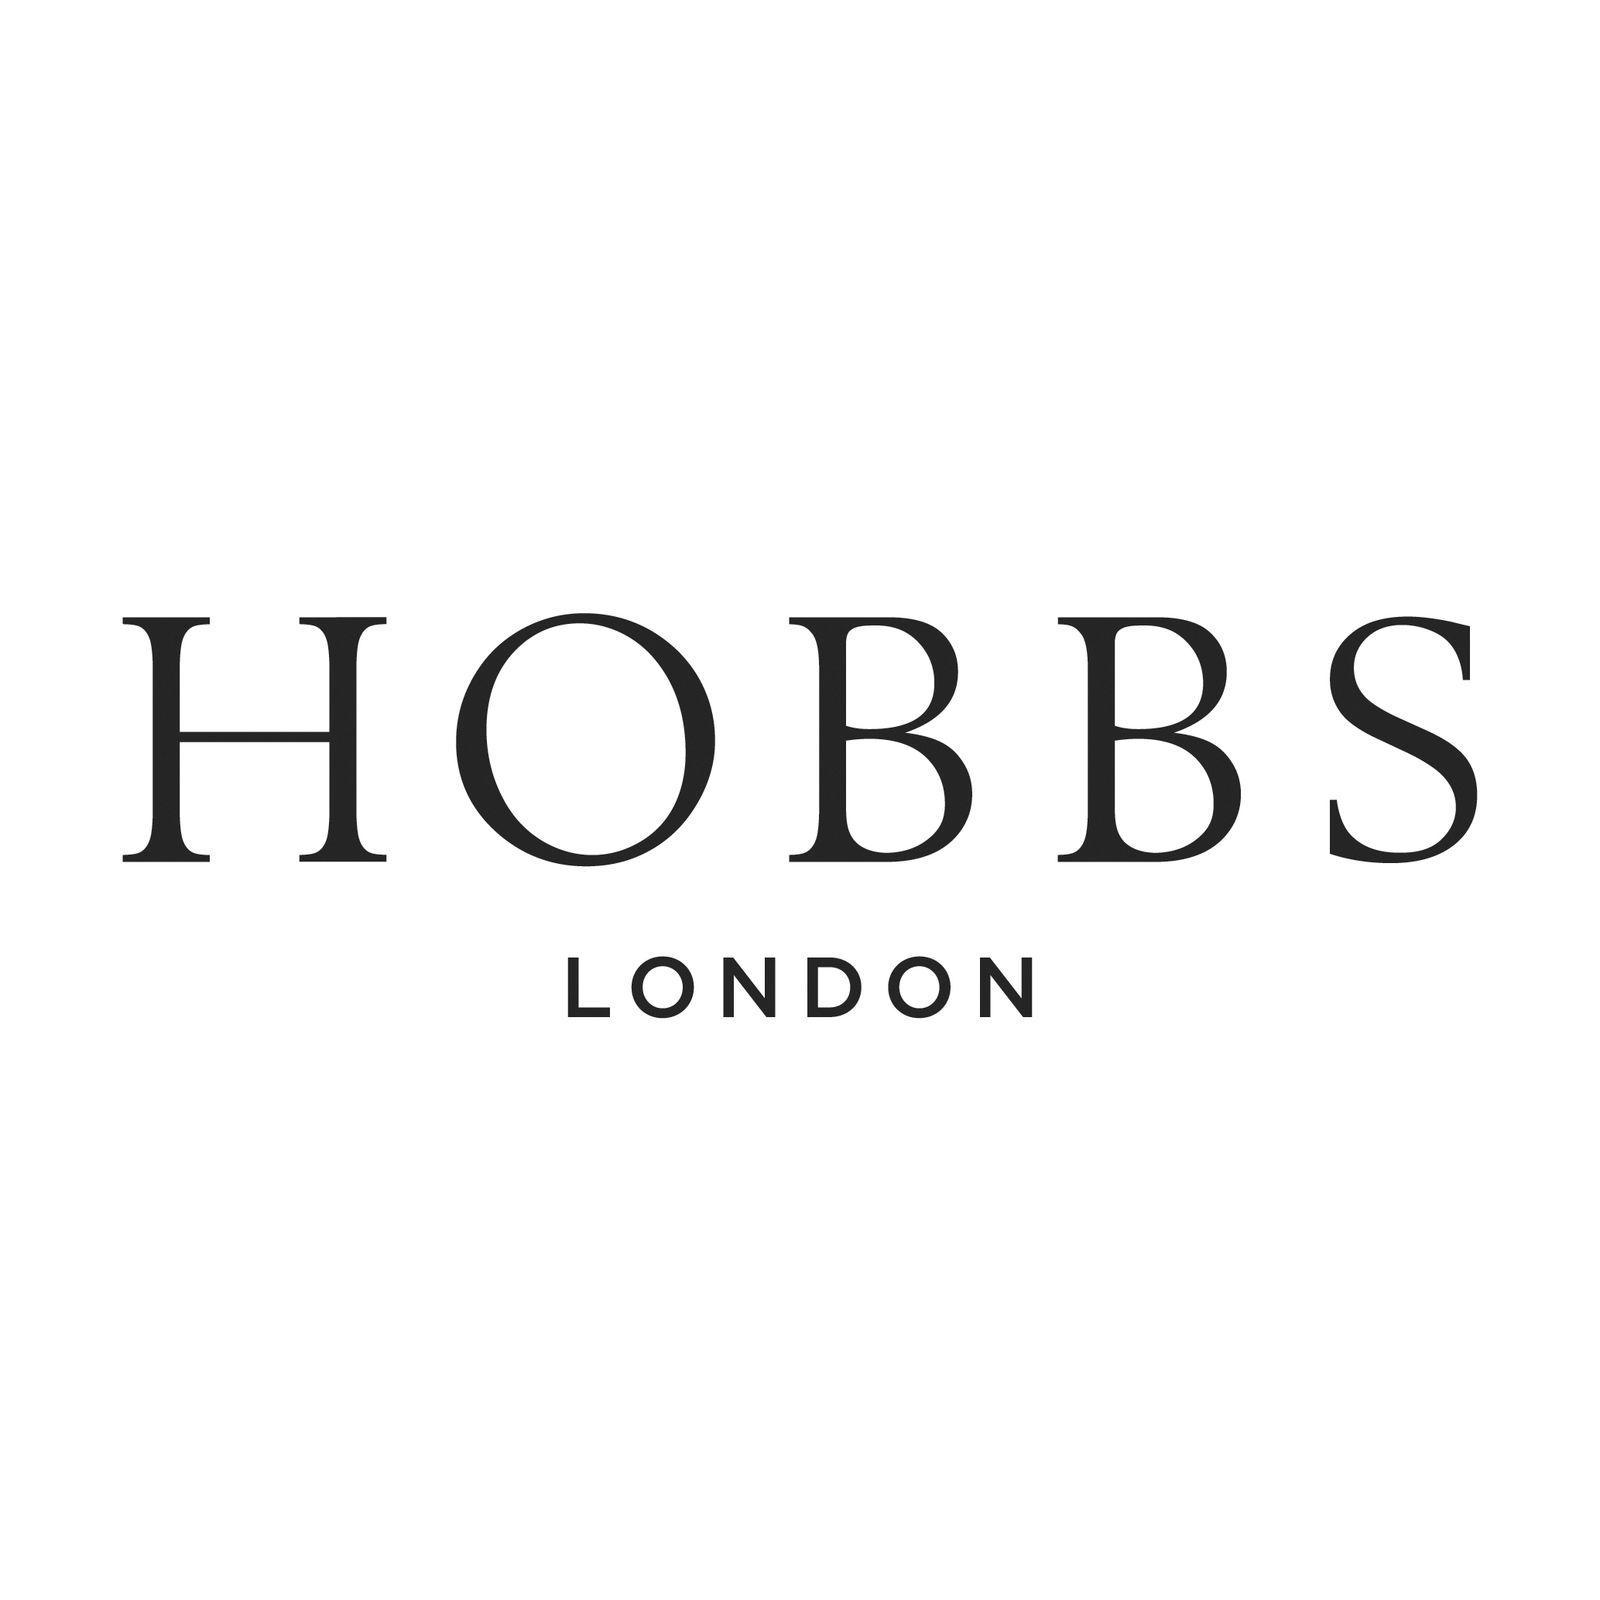 HOBBS London (Image 1)